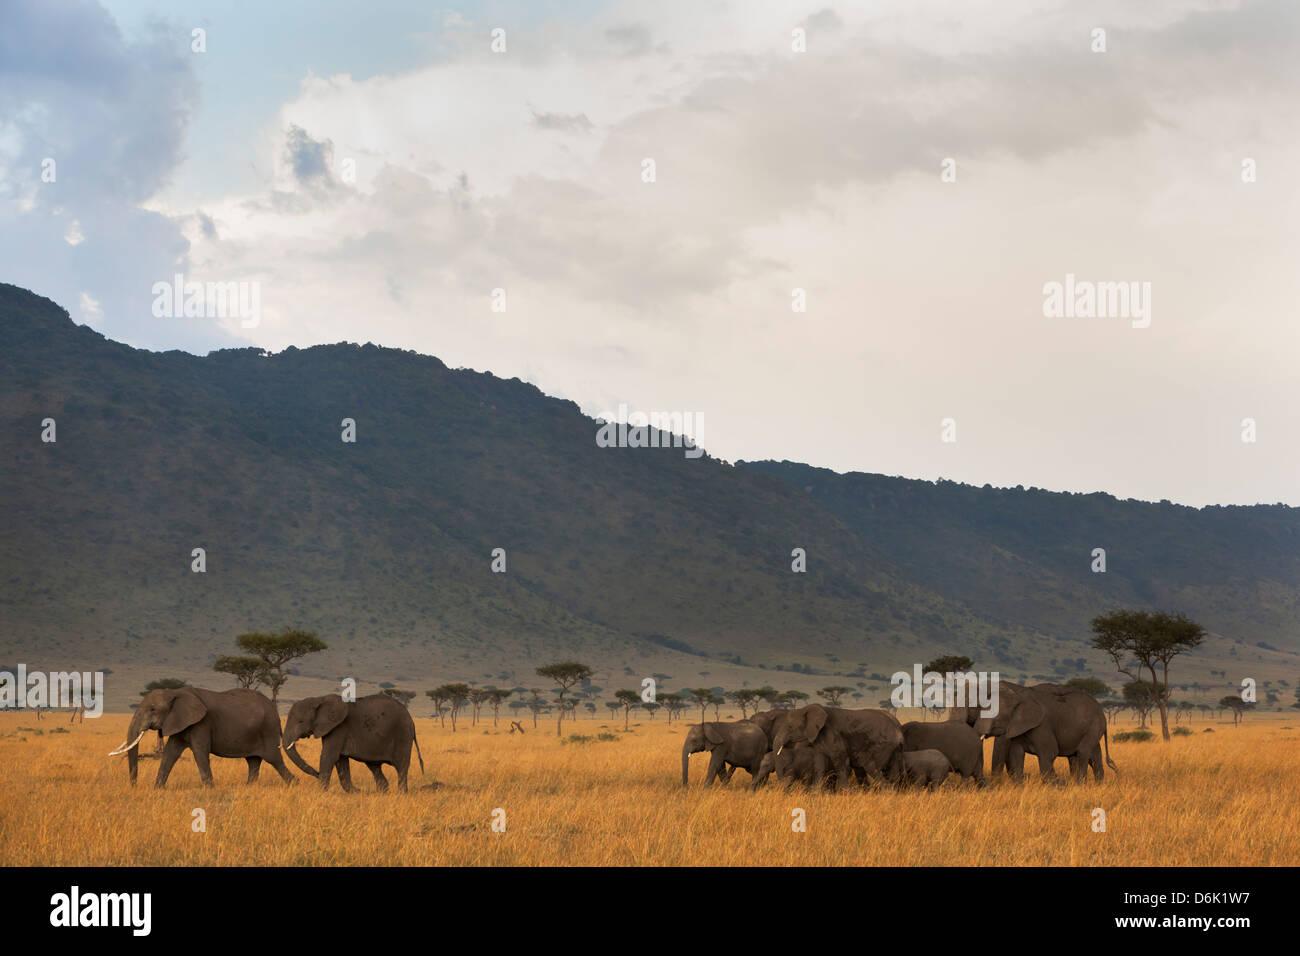 Elephant herd (Loxodonta africana), Masai Mara National Reserve, Kenya, East Africa, Africa - Stock Image